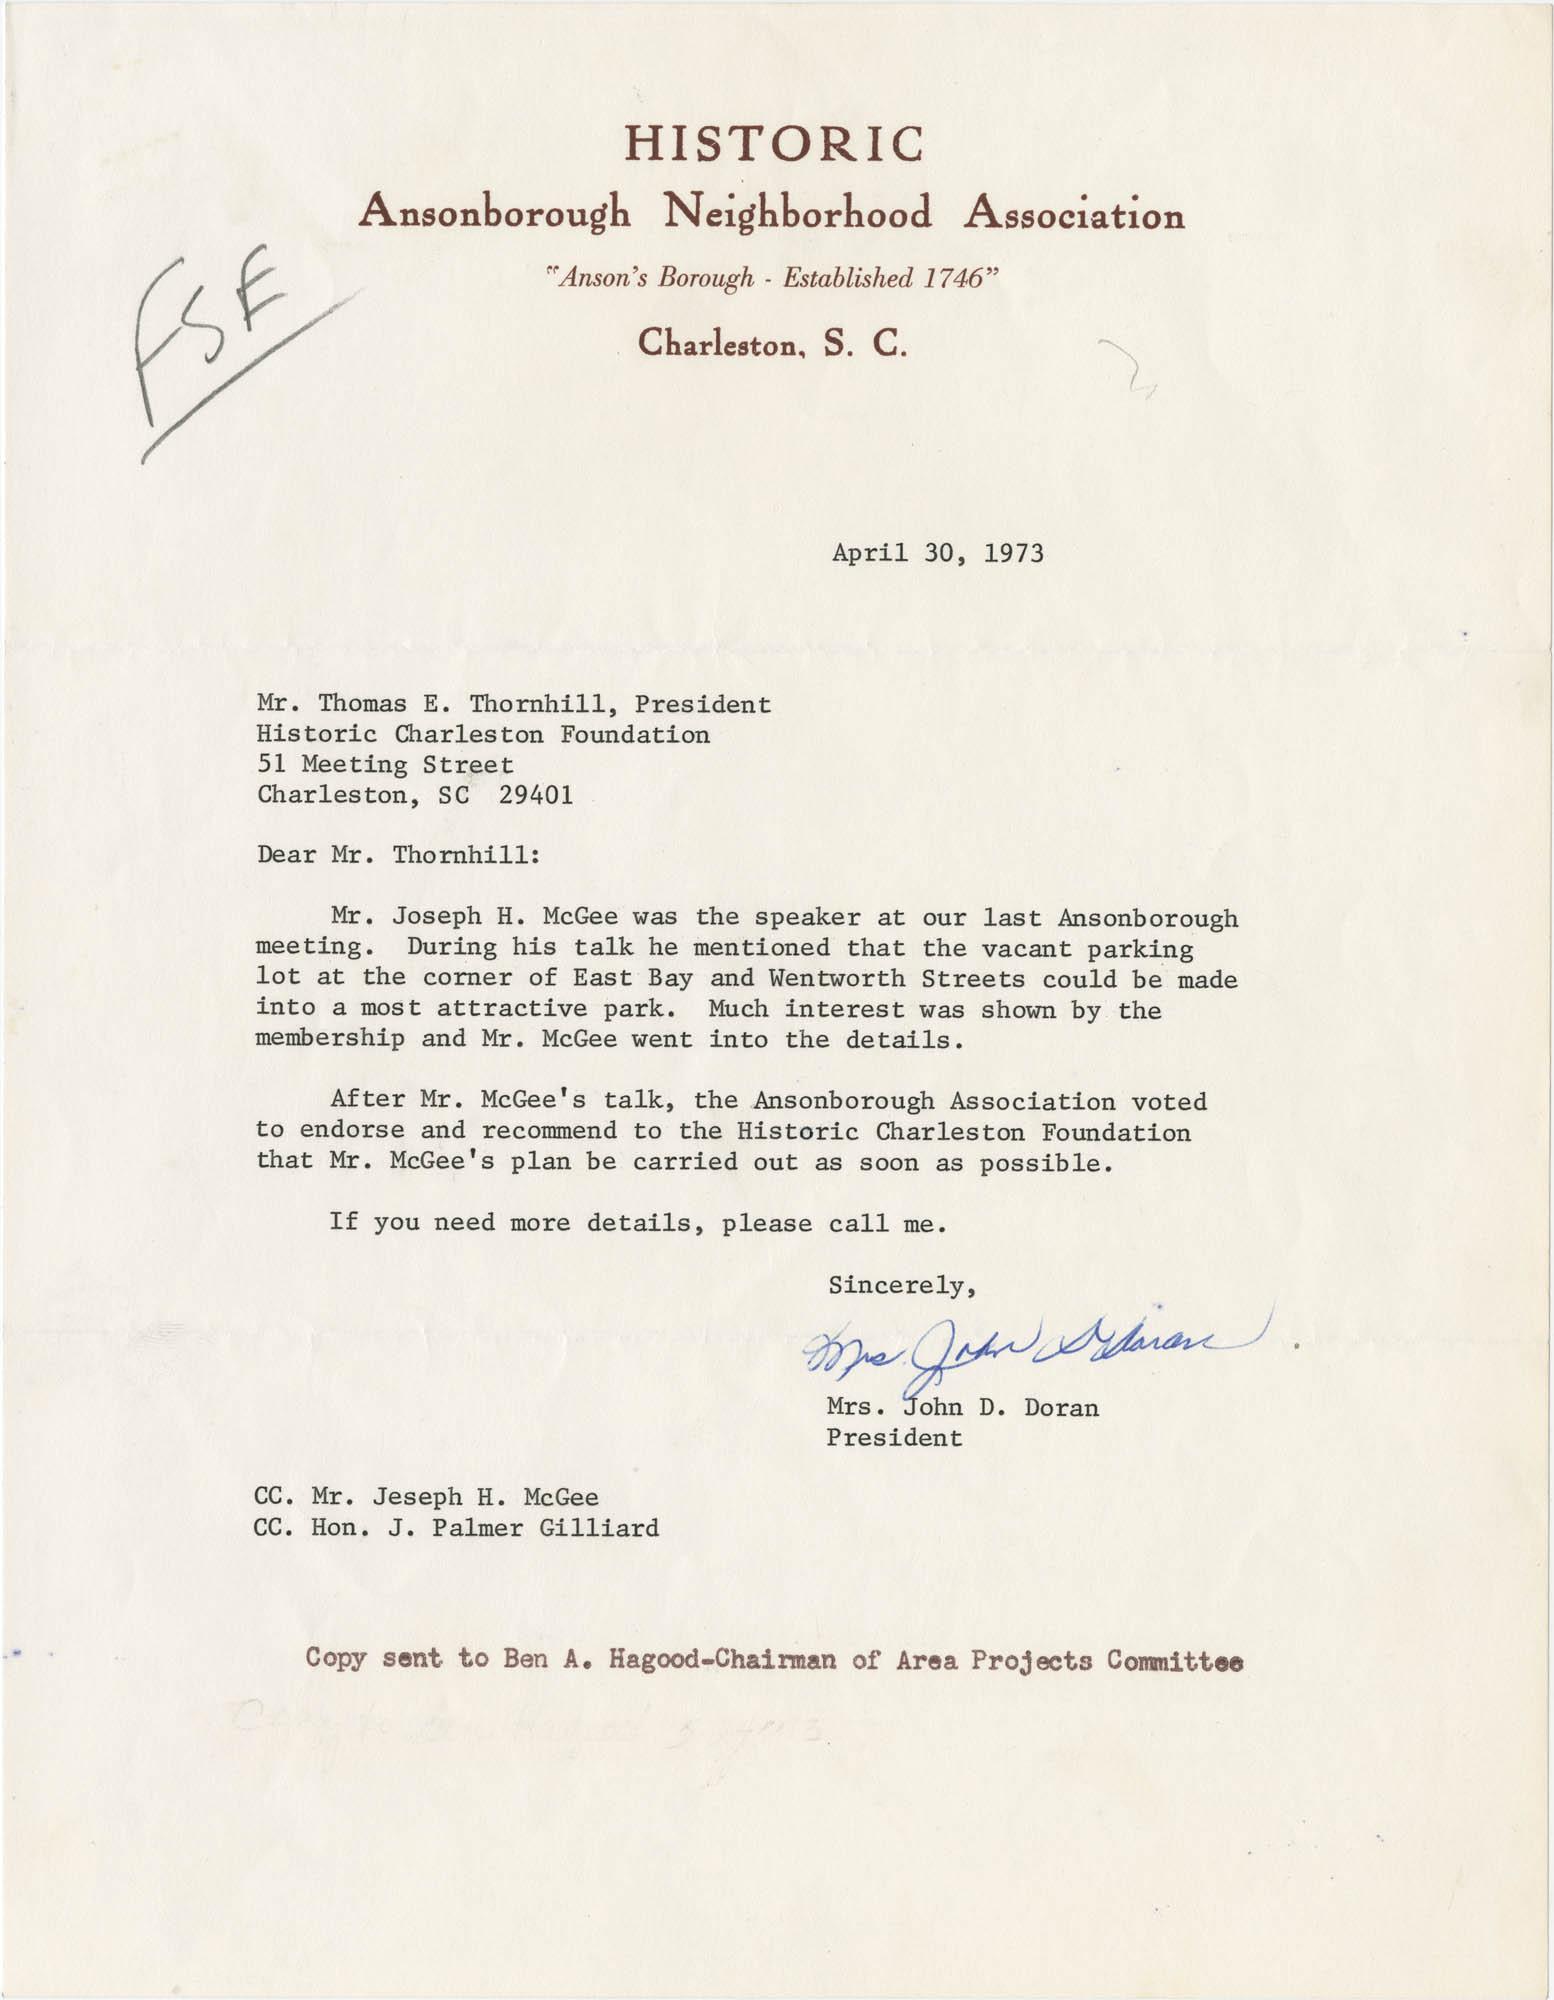 Letter from Mrs. John D. Doran to Thomas E. Thornhill